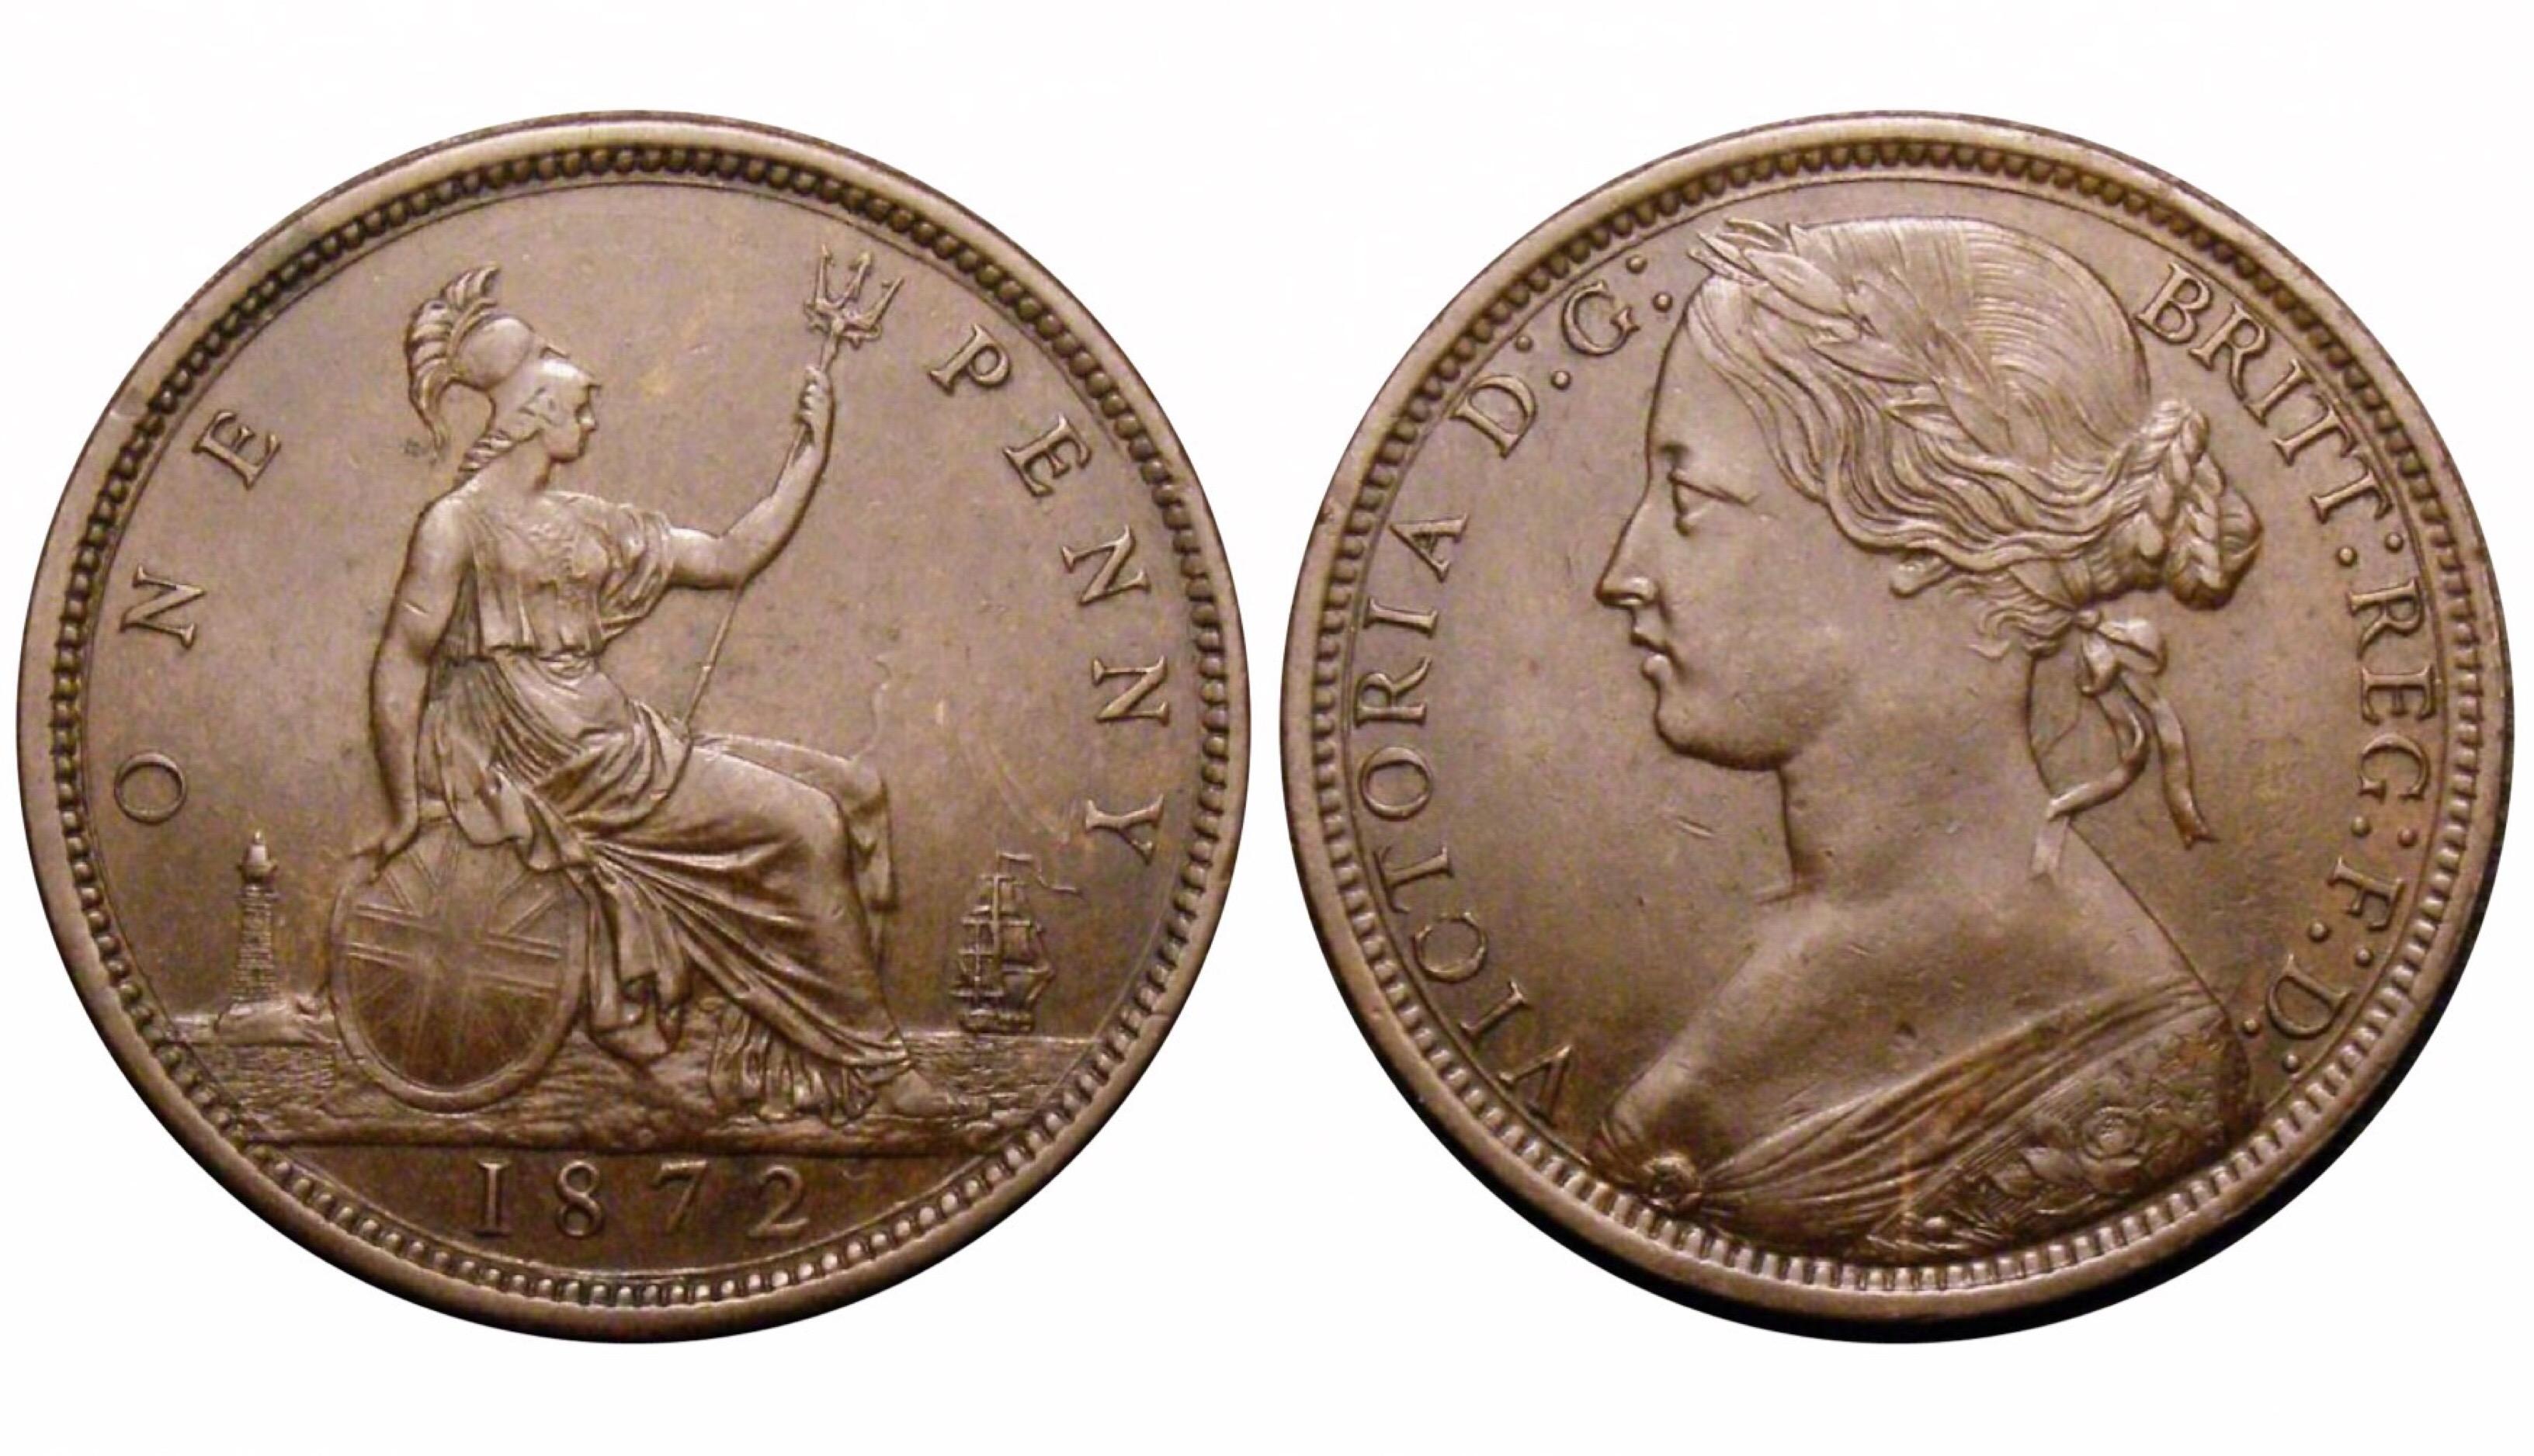 1872 Penny, CGS 70(MS 60-61), aUNC, Victoria, Gouby BP1872Ab, UIN 37296